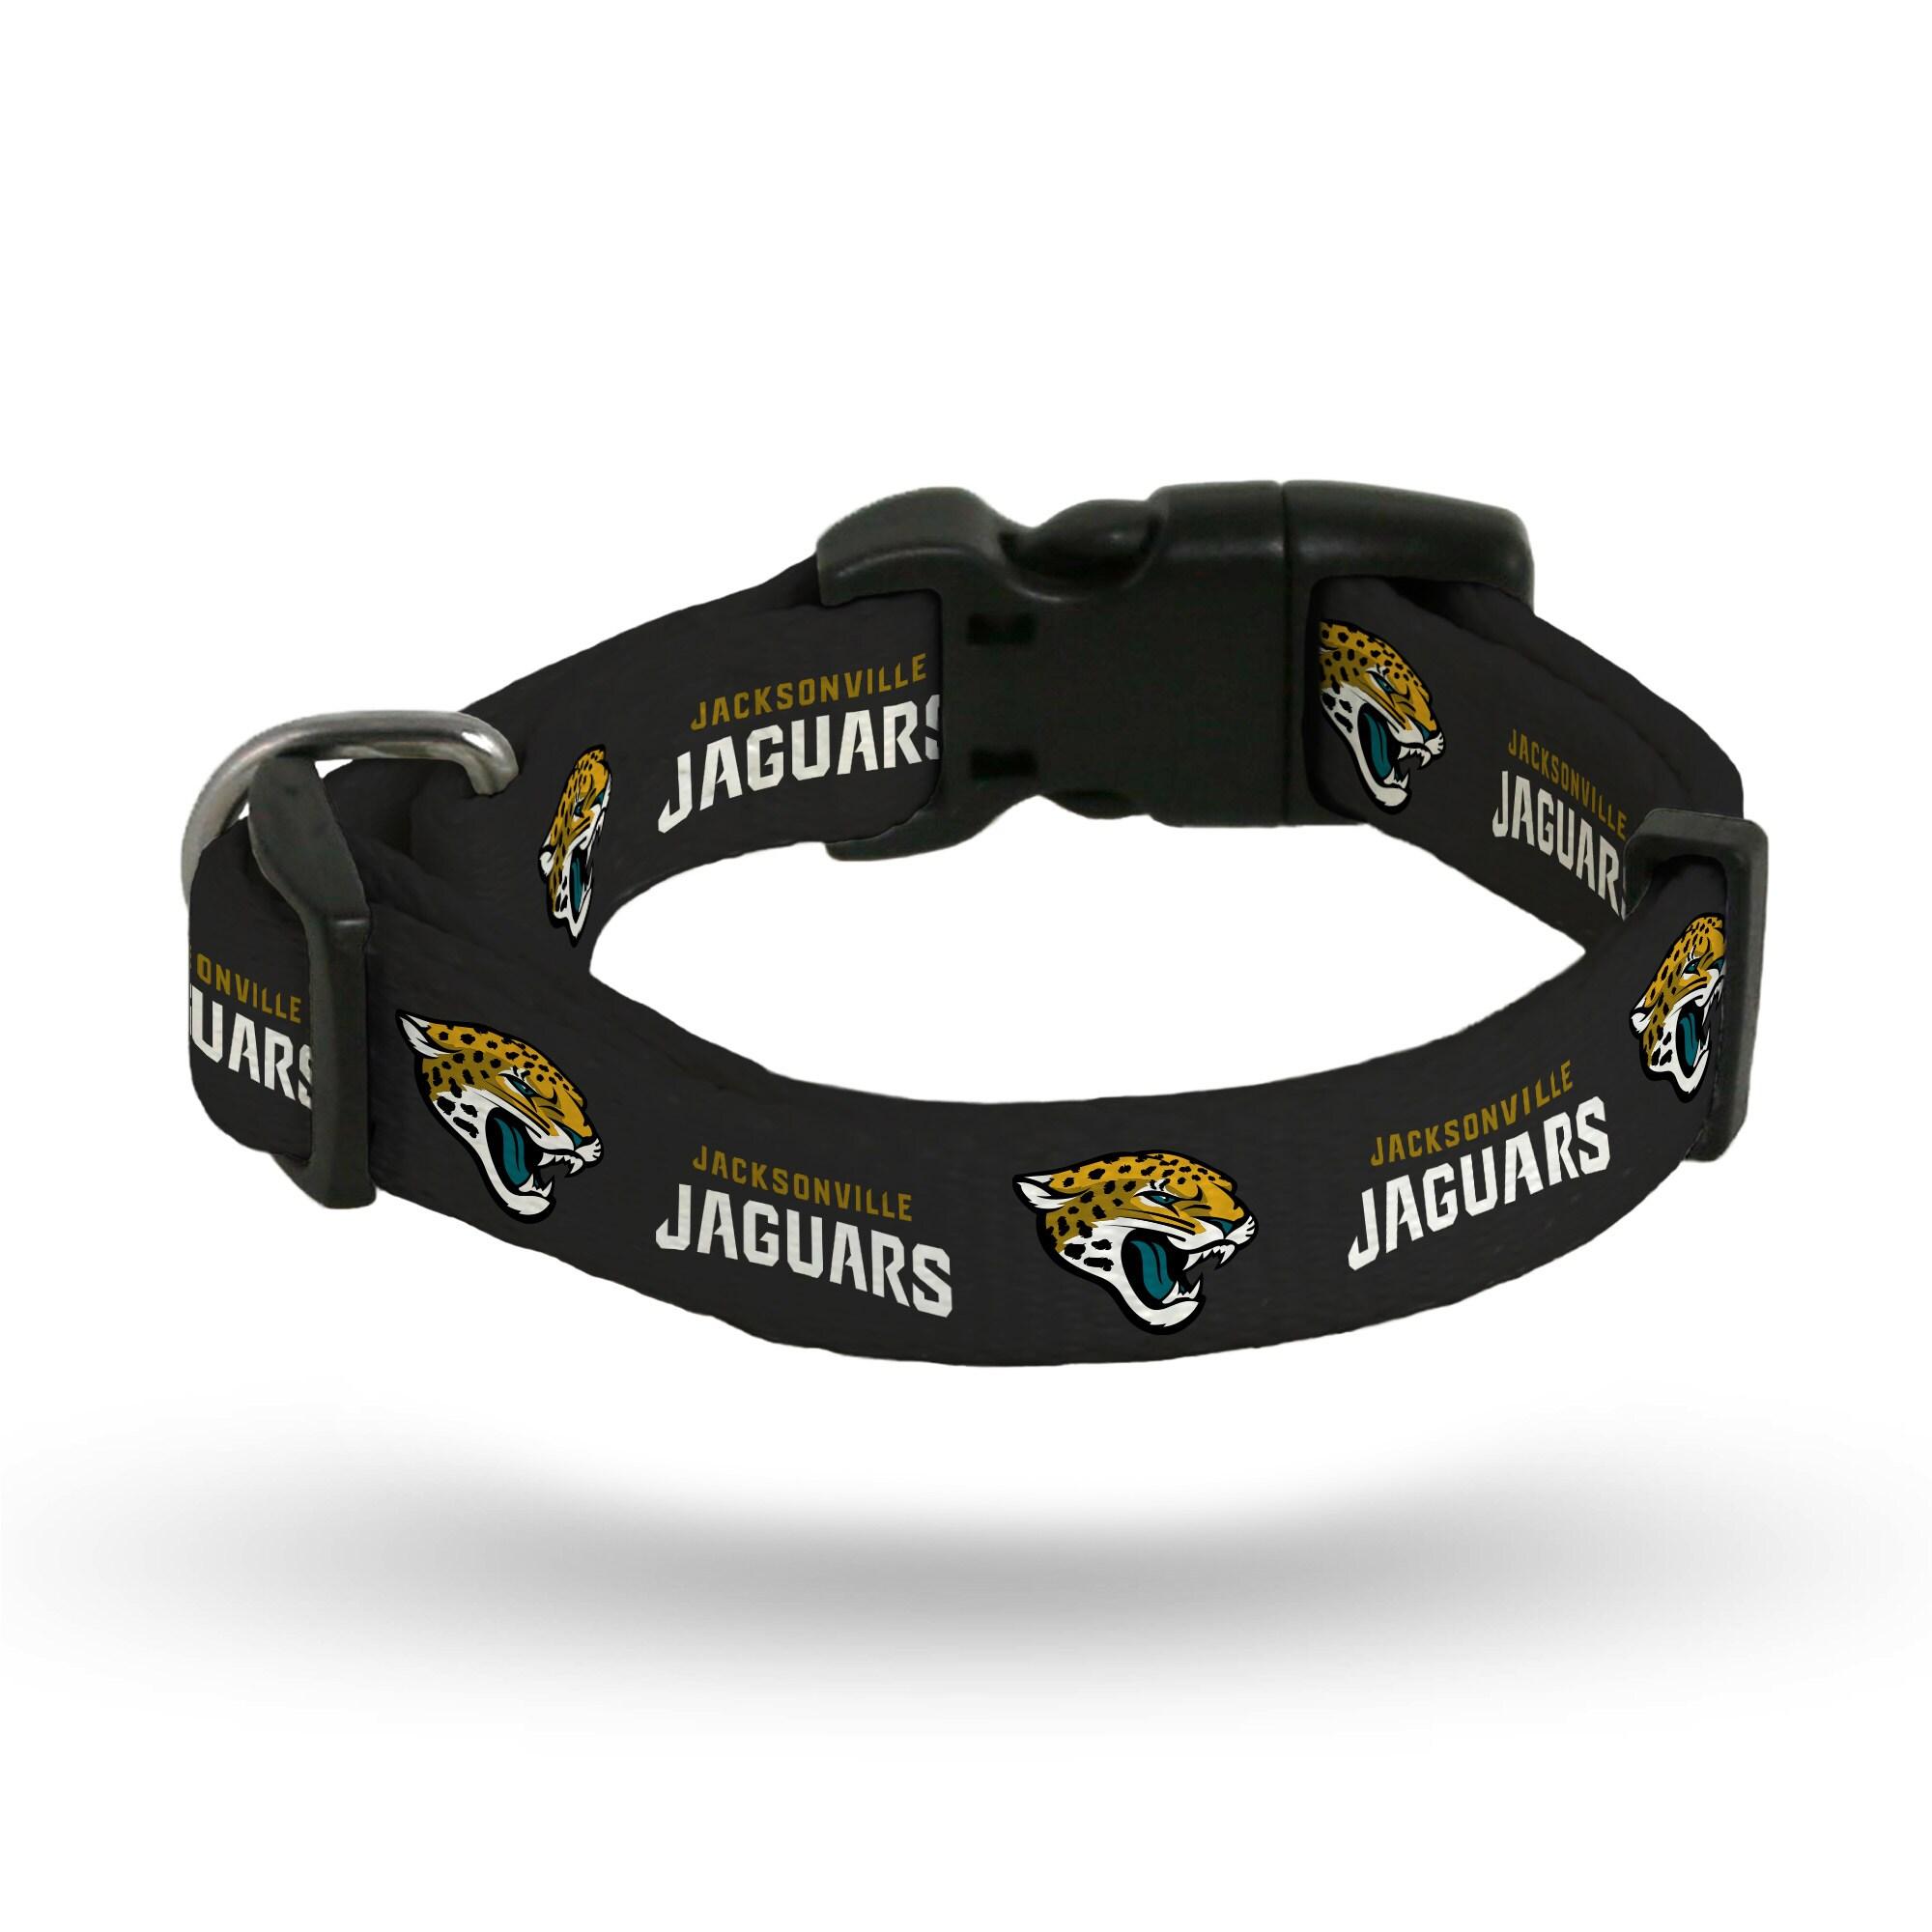 Jacksonville Jaguars Sparo Rugged Pet Collar